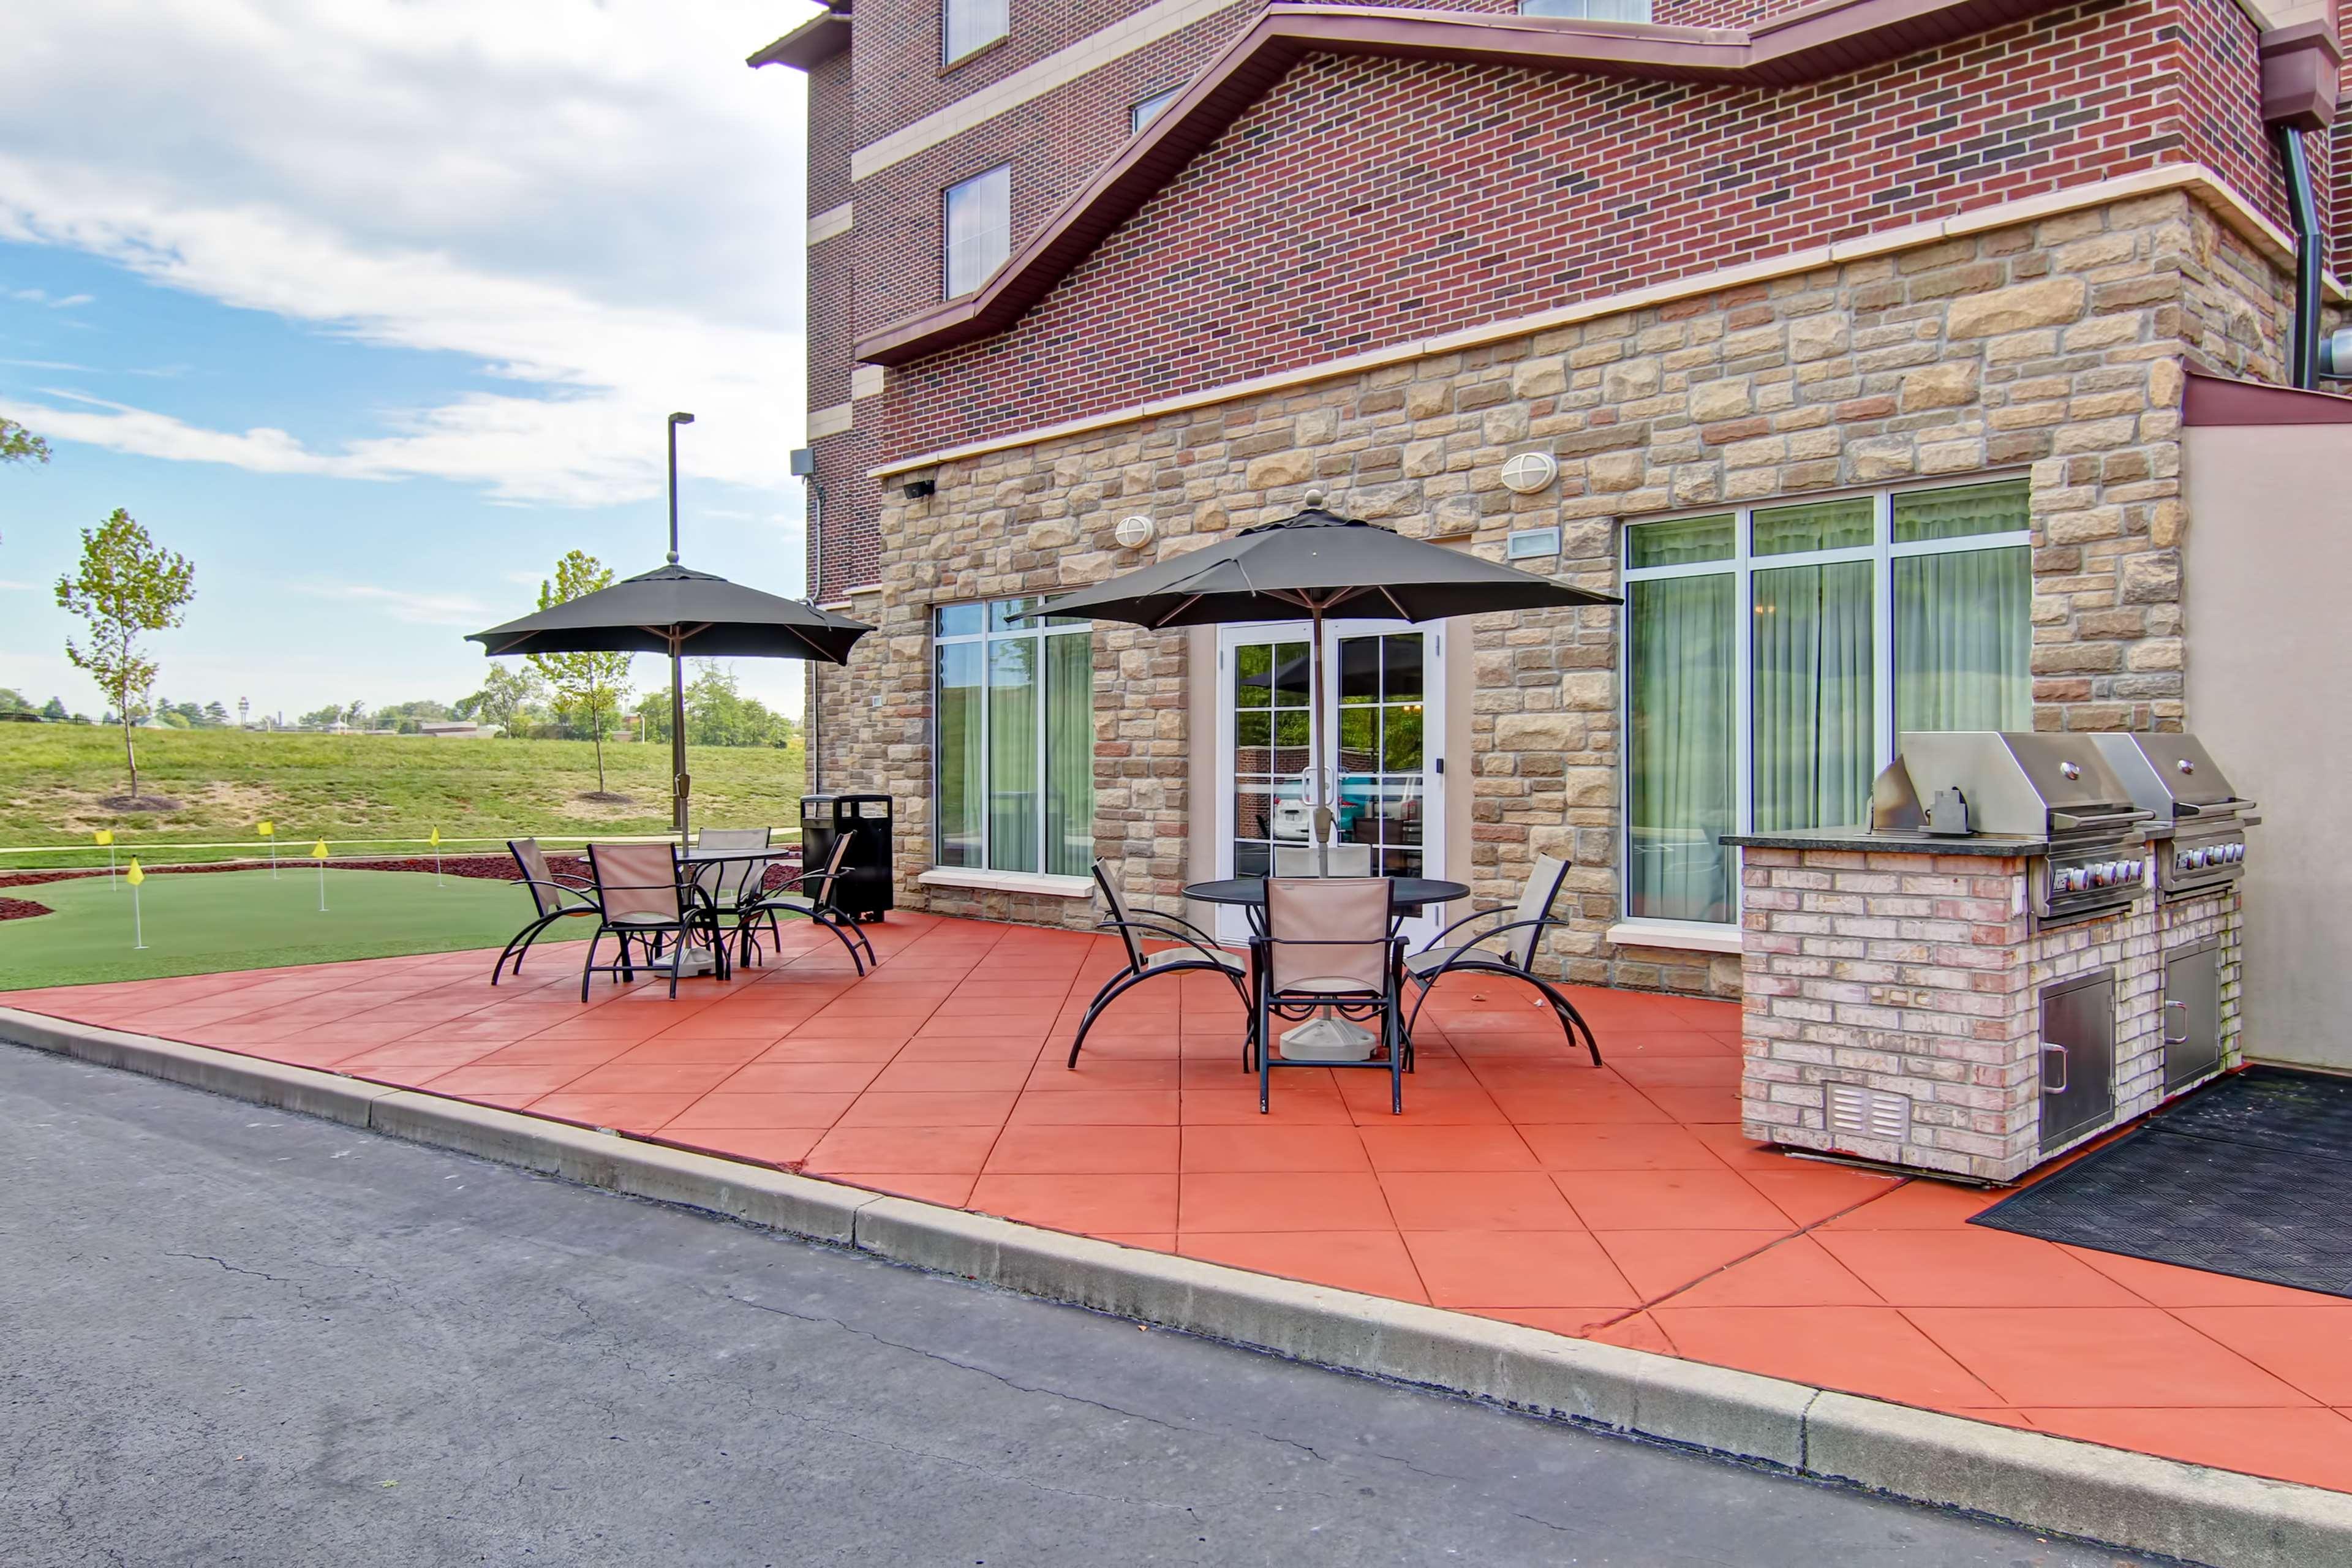 Homewood Suites by Hilton Cincinnati Airport South-Florence image 12